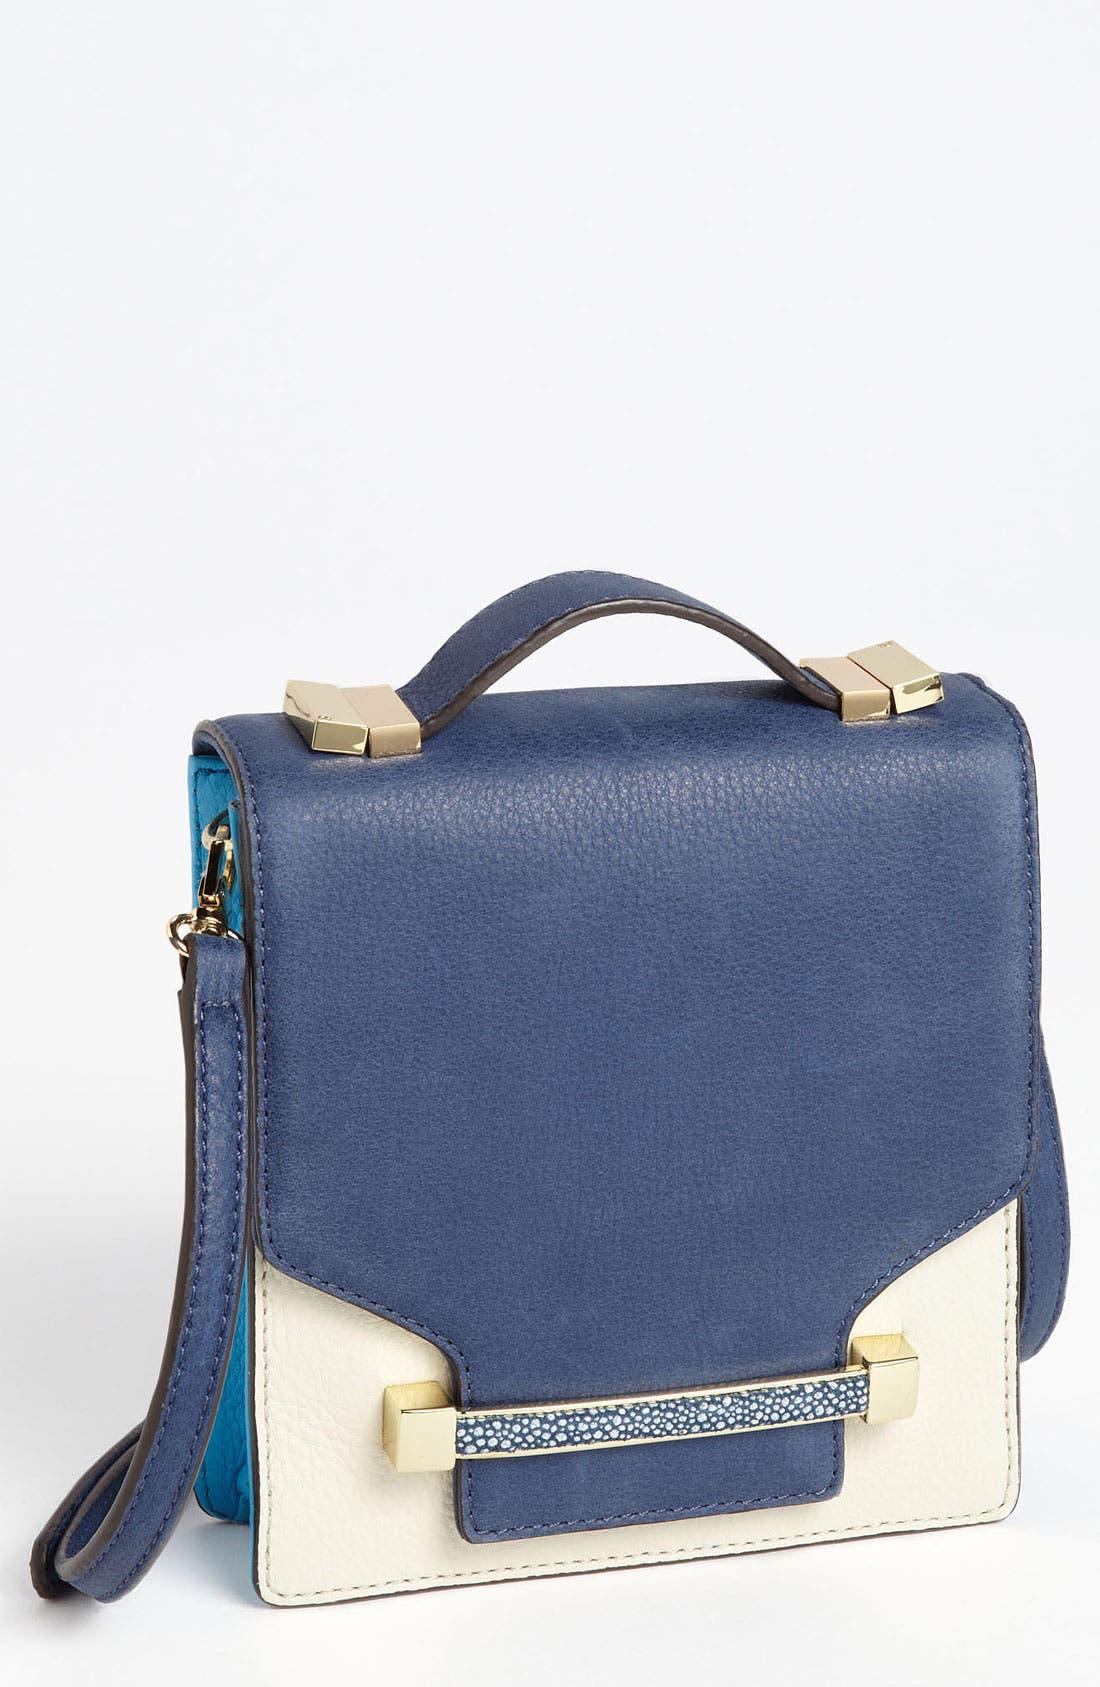 Alternate Image 1 Selected - Vince Camuto 'Julia' Crossbody Bag